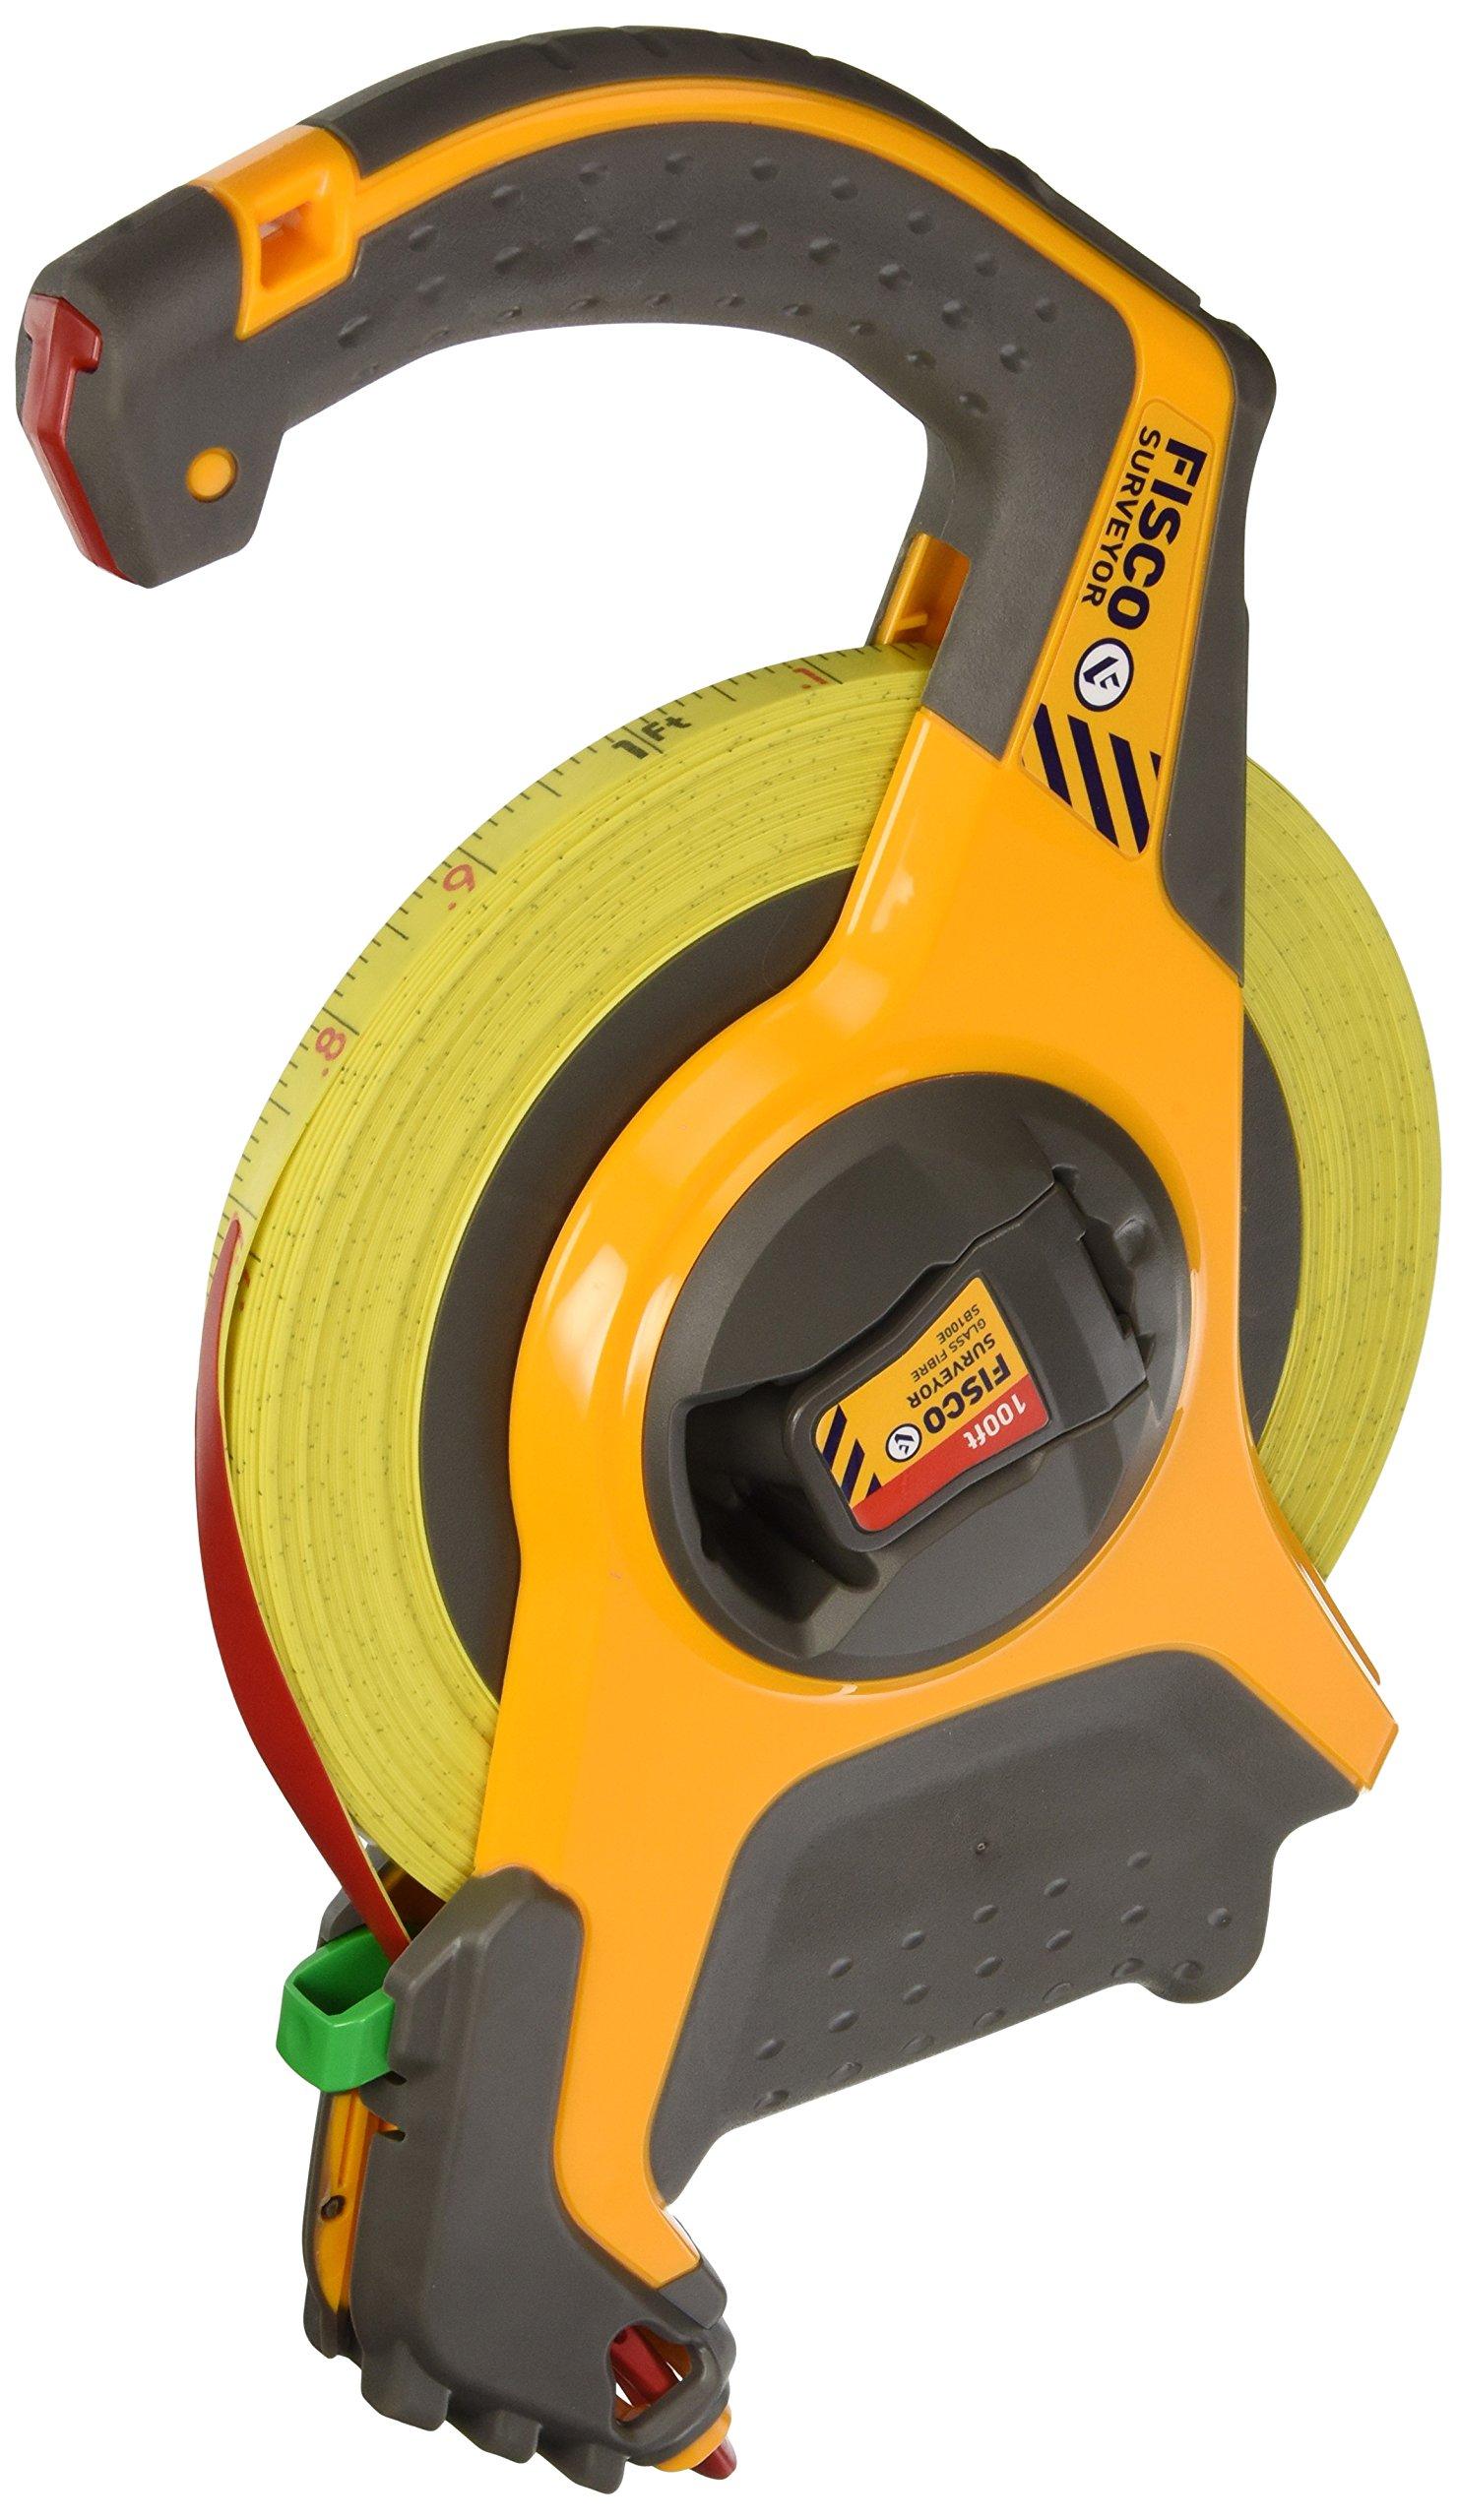 Fisco Tools SB100E Surveyor-Feets Fiberglass Long Tape, 1/2-Inch by 100-Feet